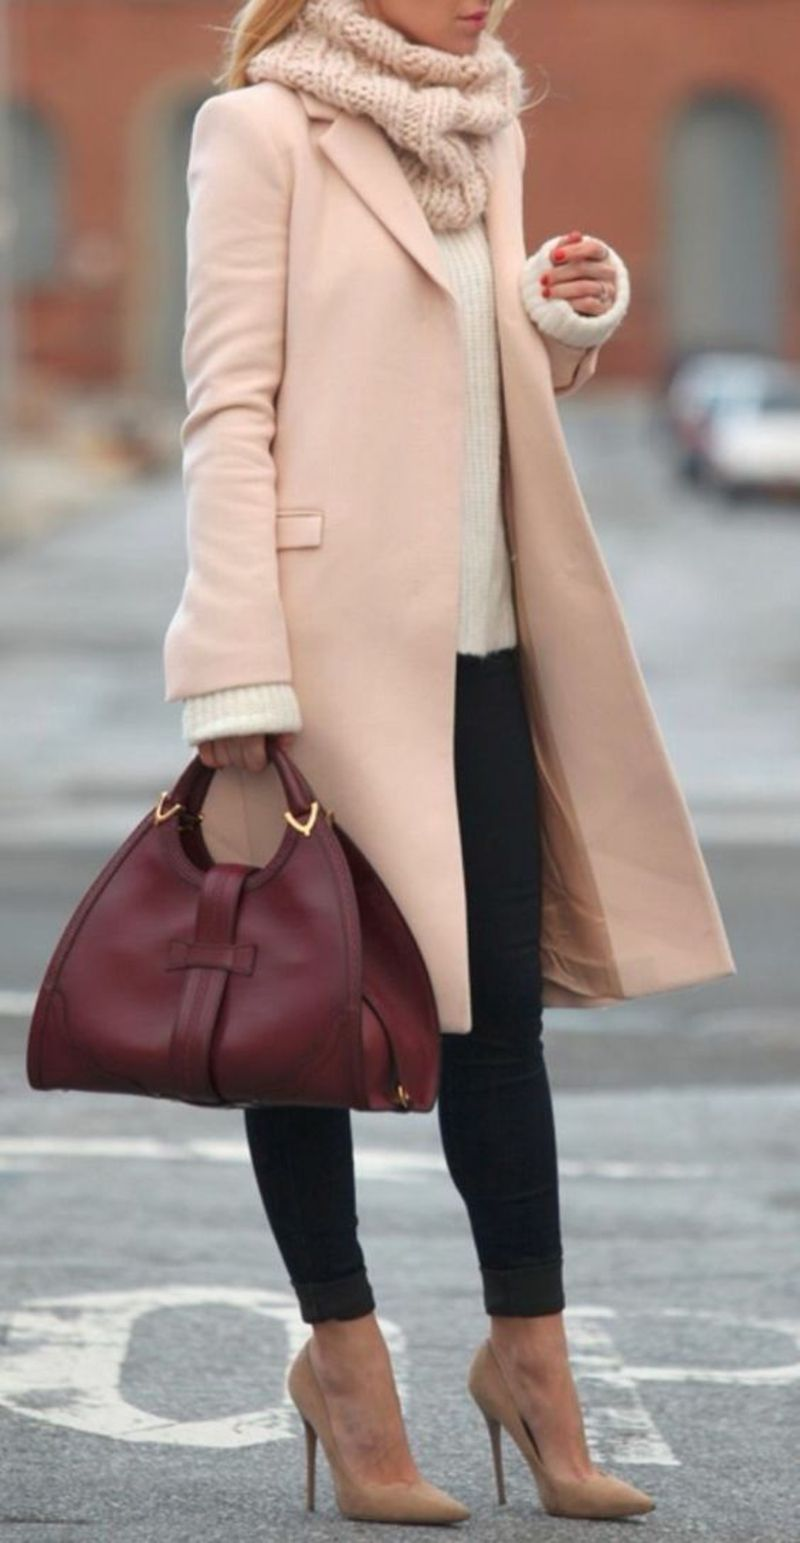 wintermantel handtasche vollenden das stilvolle business outfit casual outfit pinterest. Black Bedroom Furniture Sets. Home Design Ideas